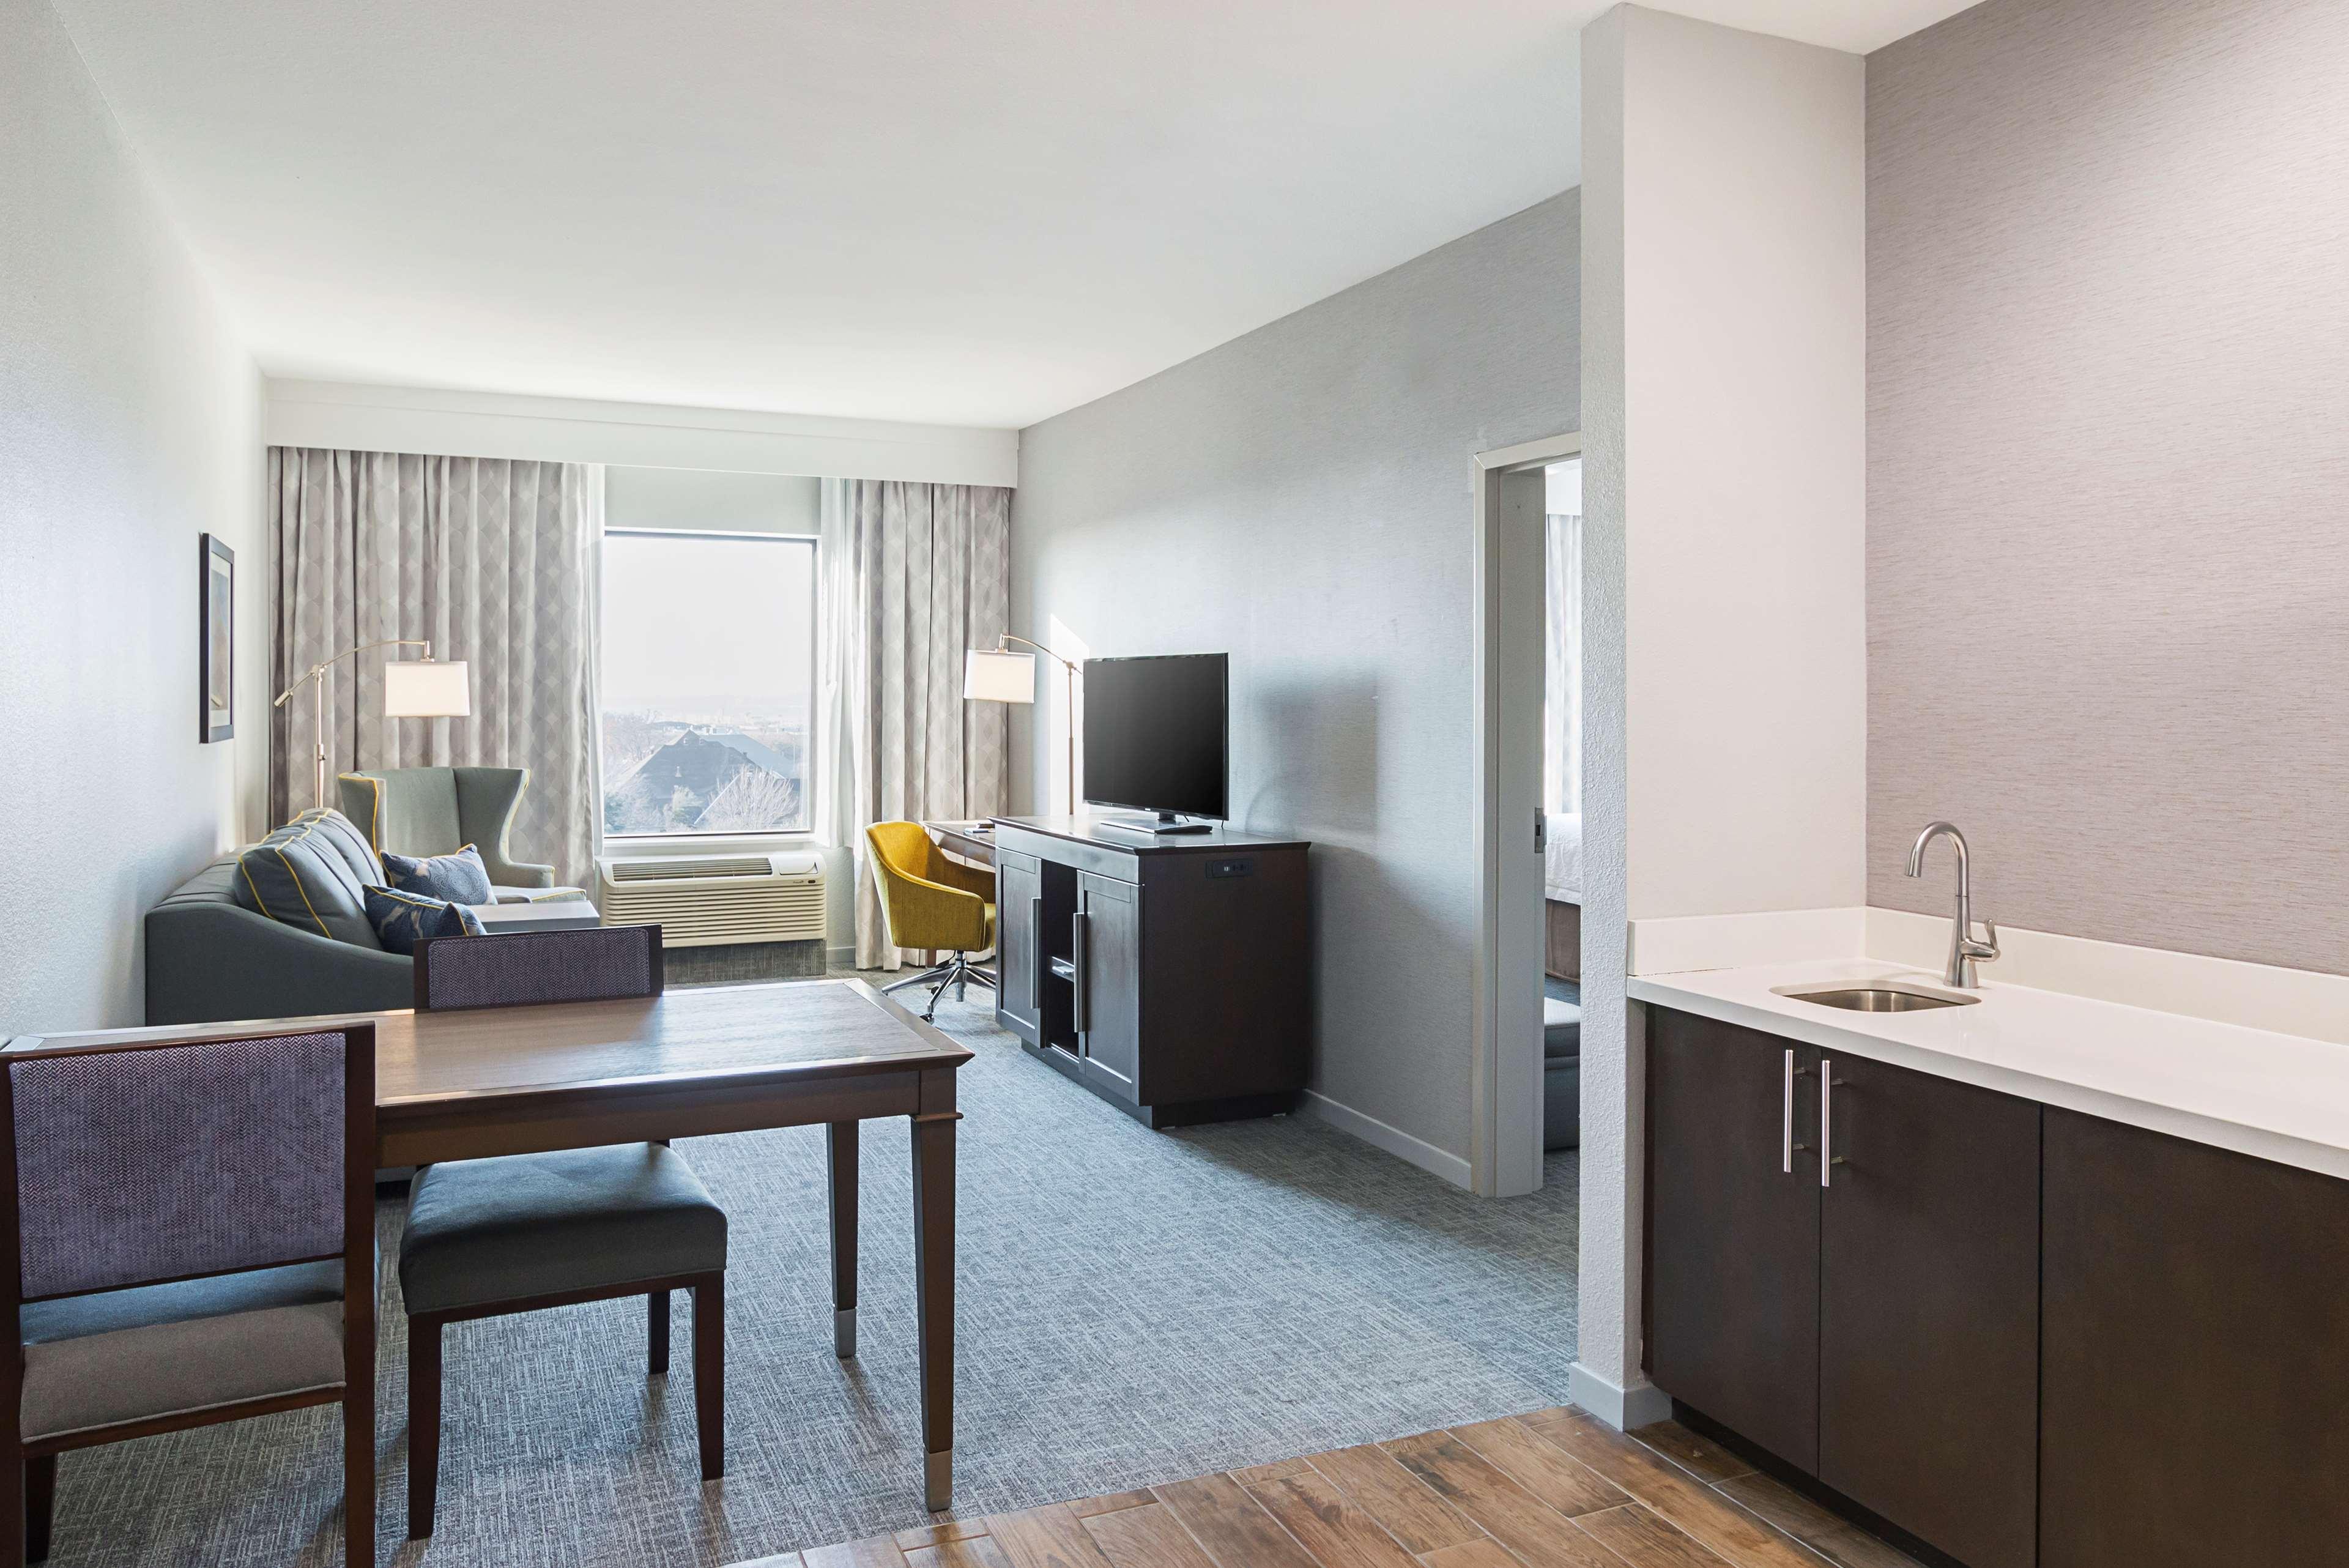 Hampton Inn & Suites Colleyville DFW West image 40